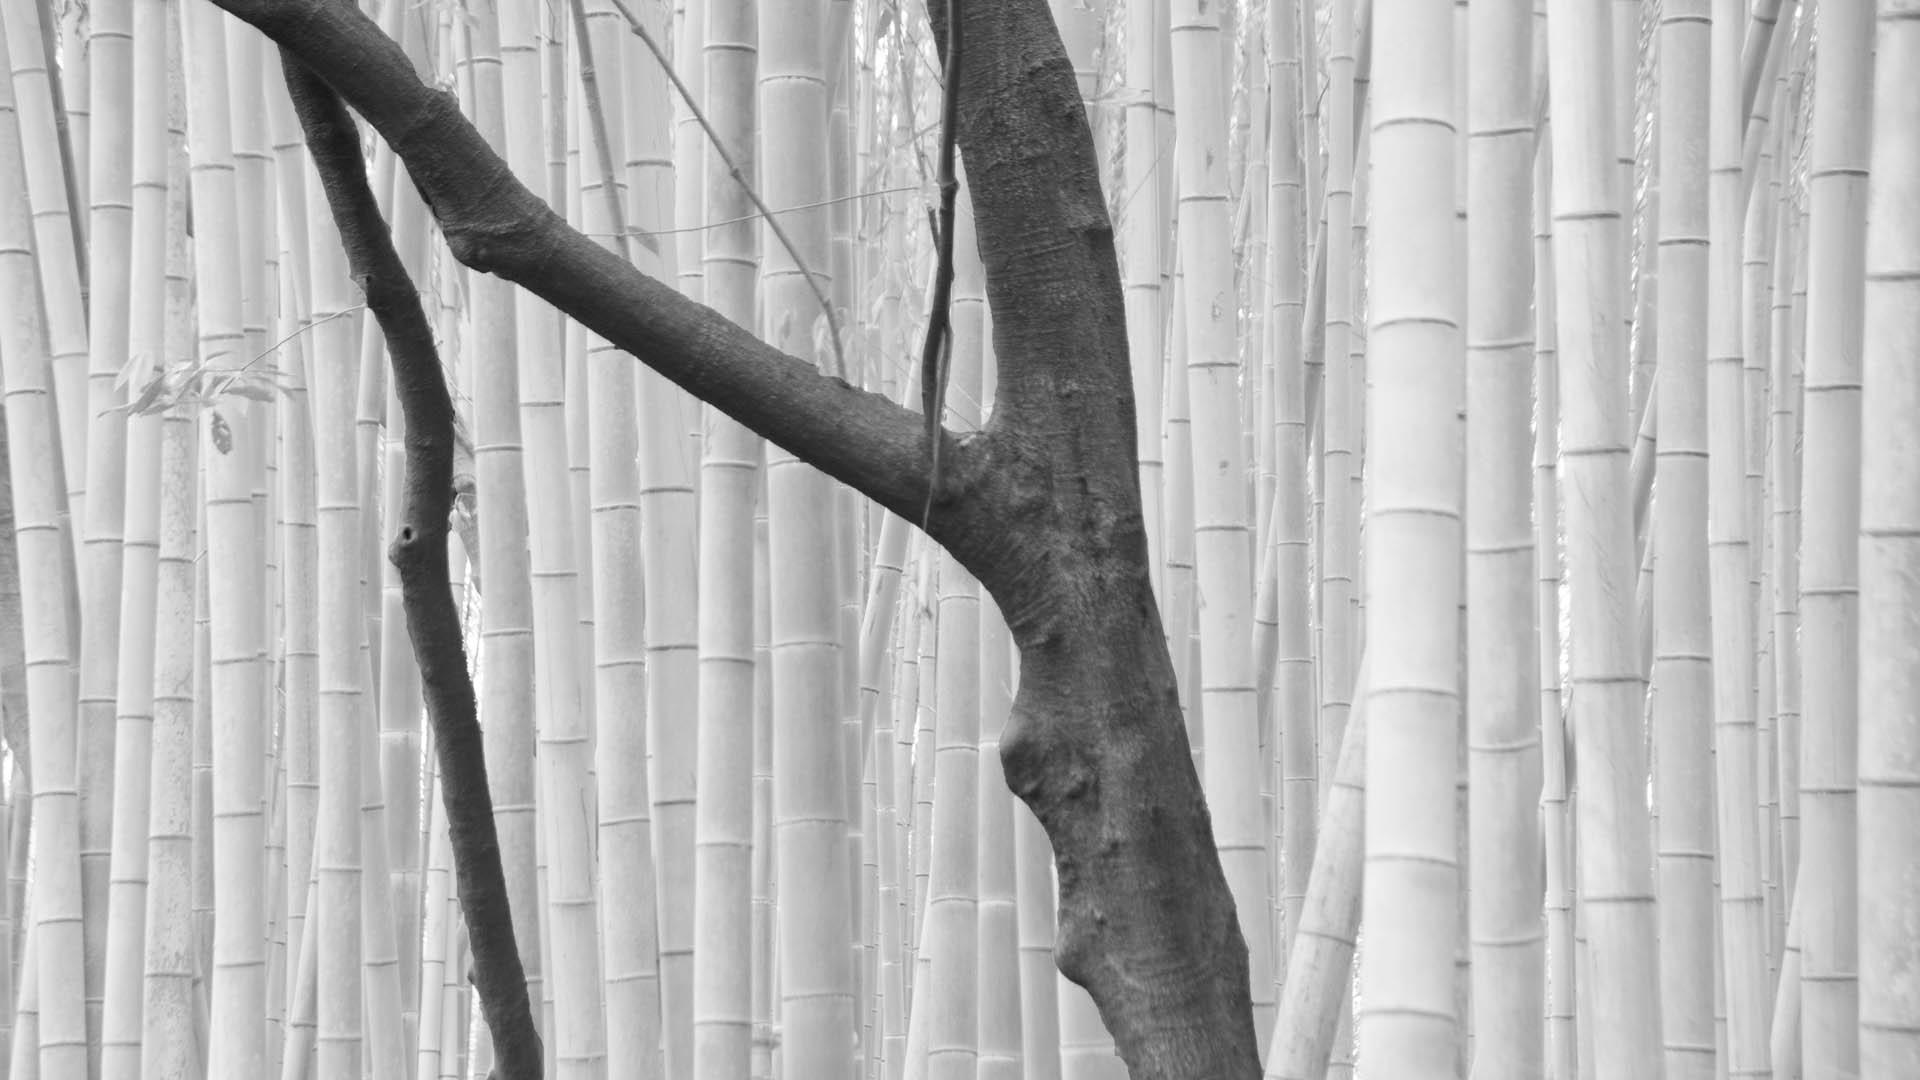 Japan - Bamboebos bij  Arashiyama, Kyoto.